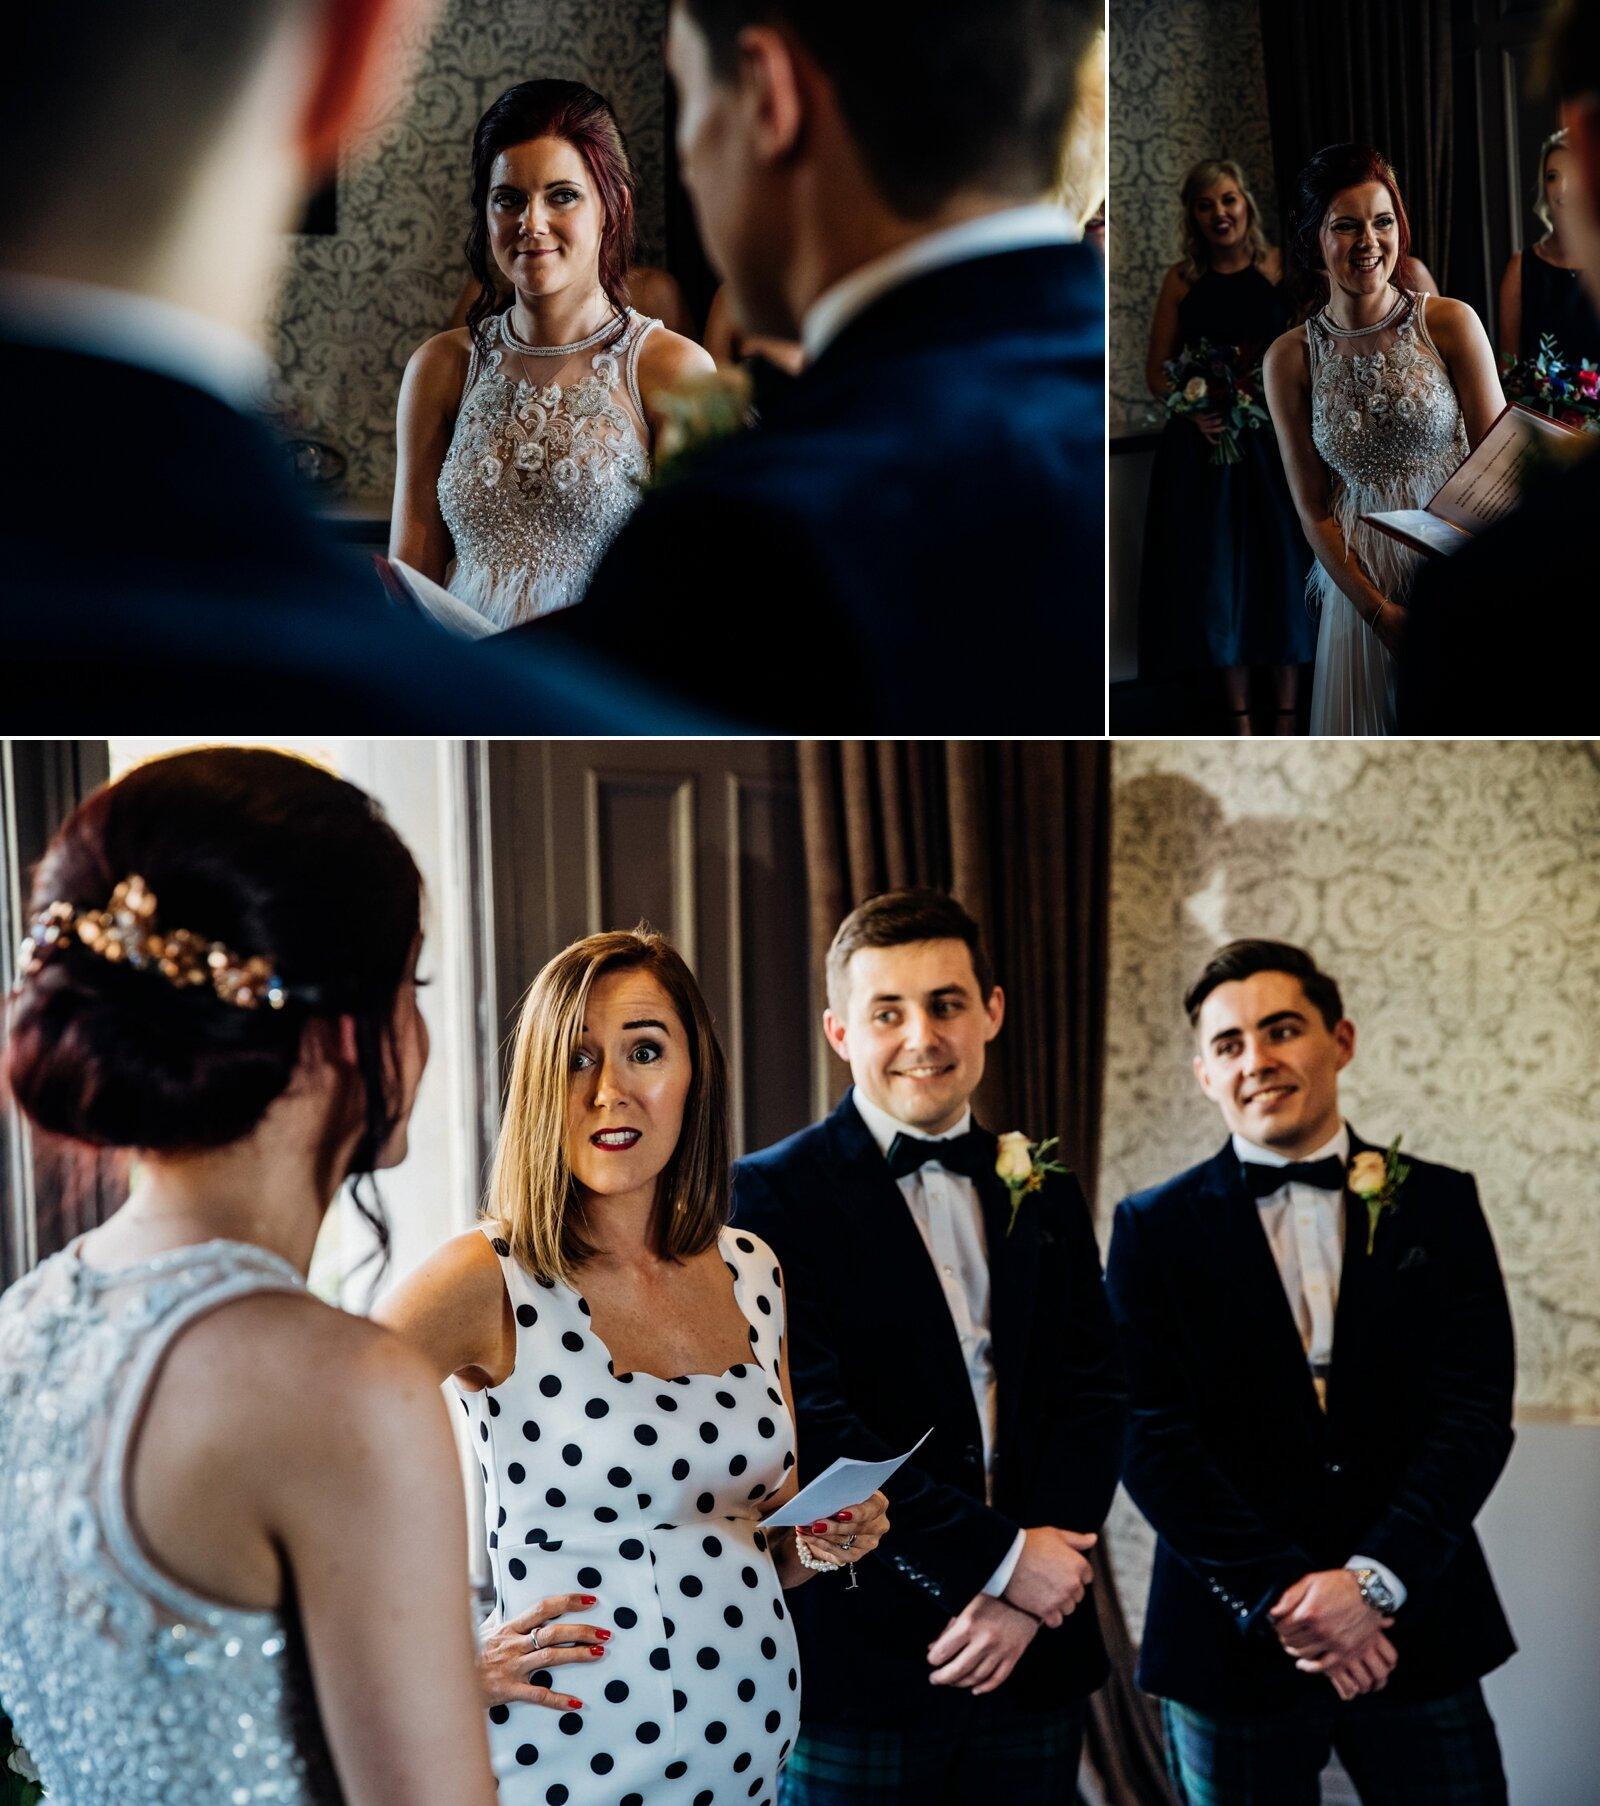 Andy&Szerdi-Photography_Ceremony_Elaine-Stephen-22.jpg